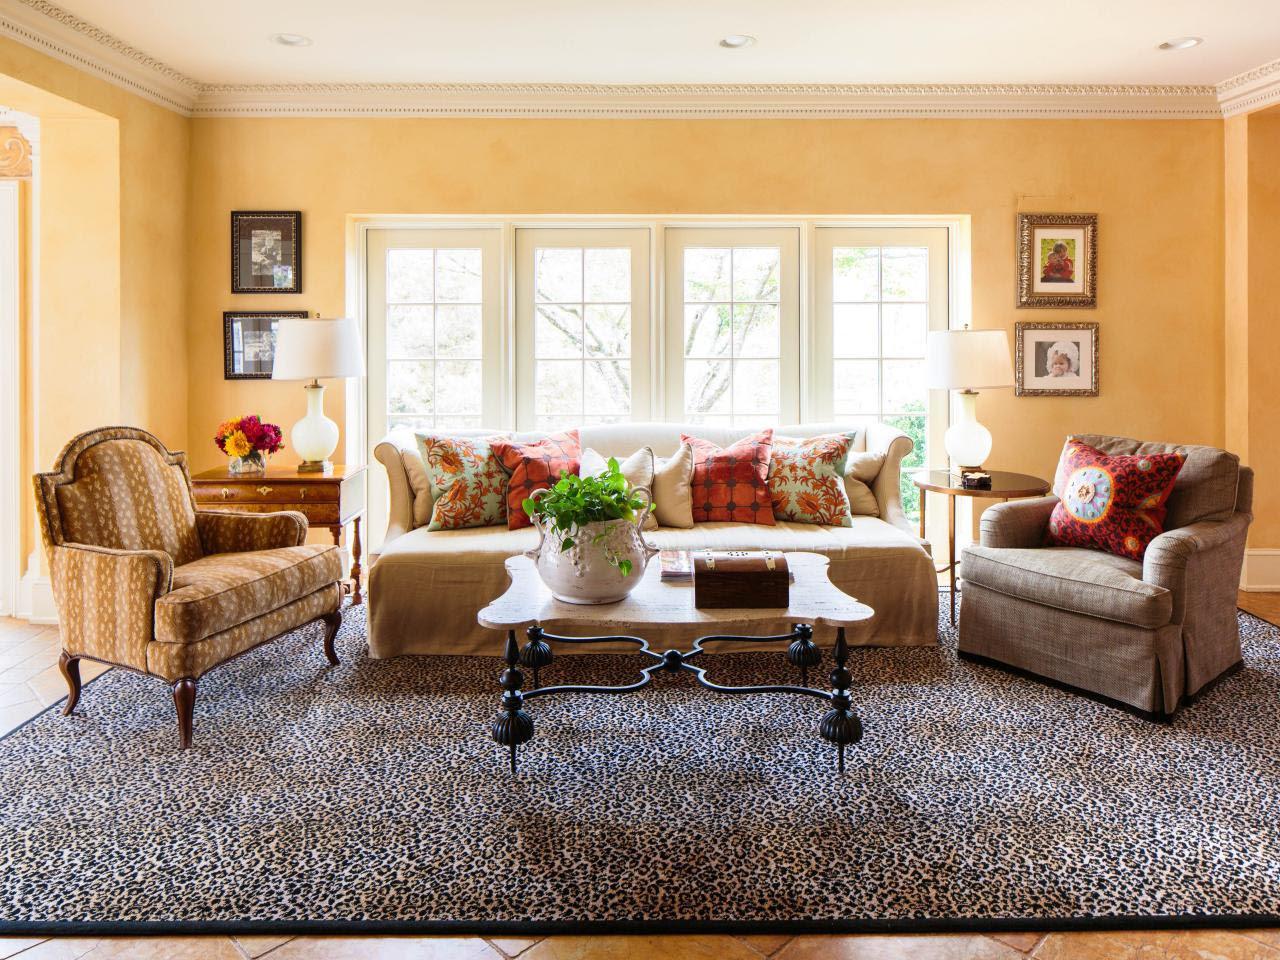 Leopard Print Living Room Decor - Zion Star